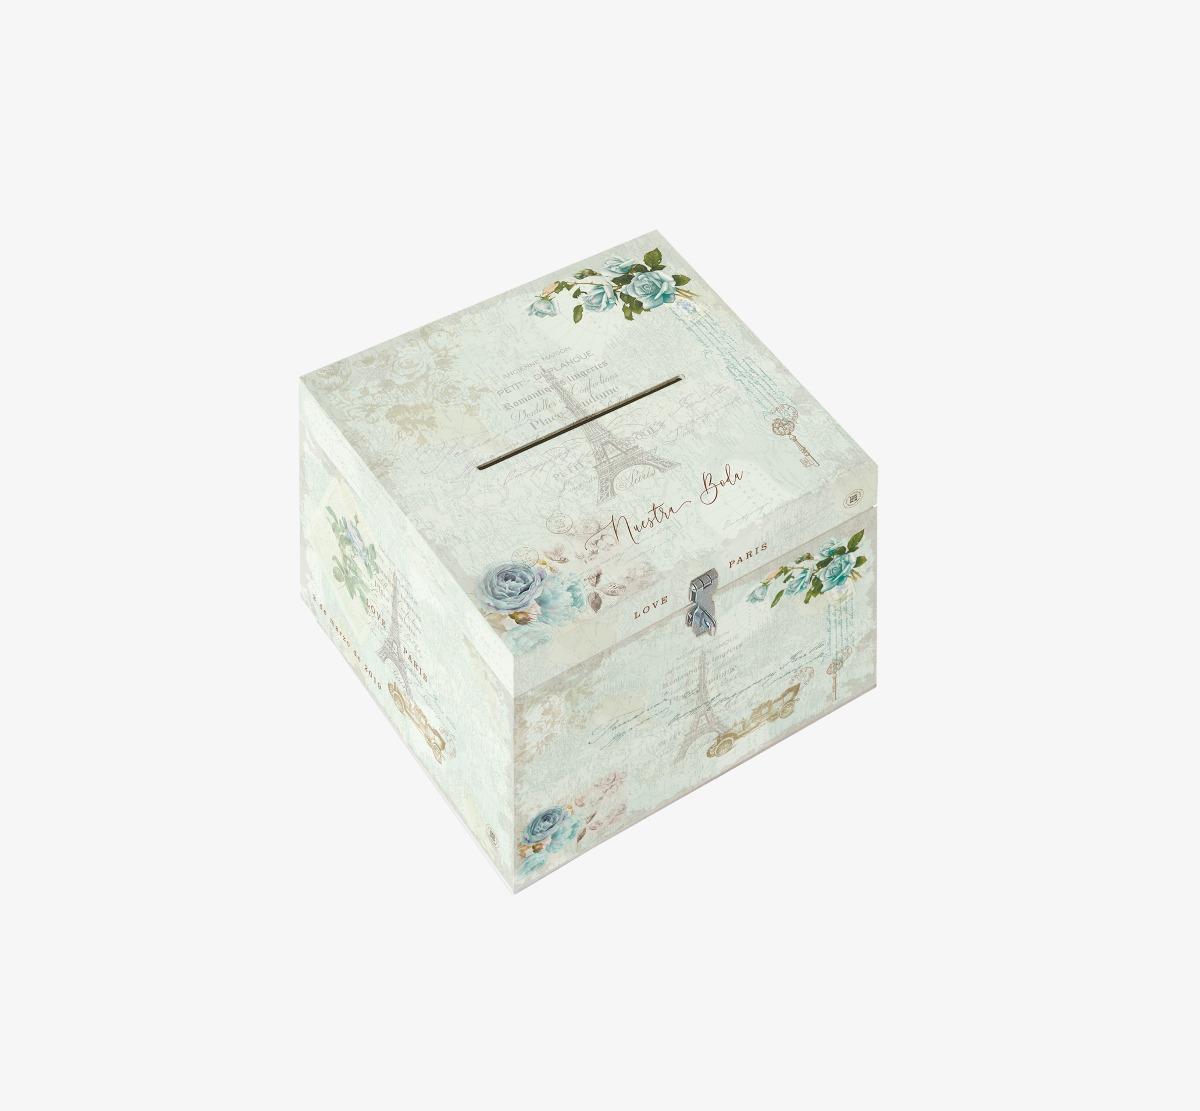 4c554f045 Baúl Cofre Urna Casamiento Madera Grand Boda Diseño Elección